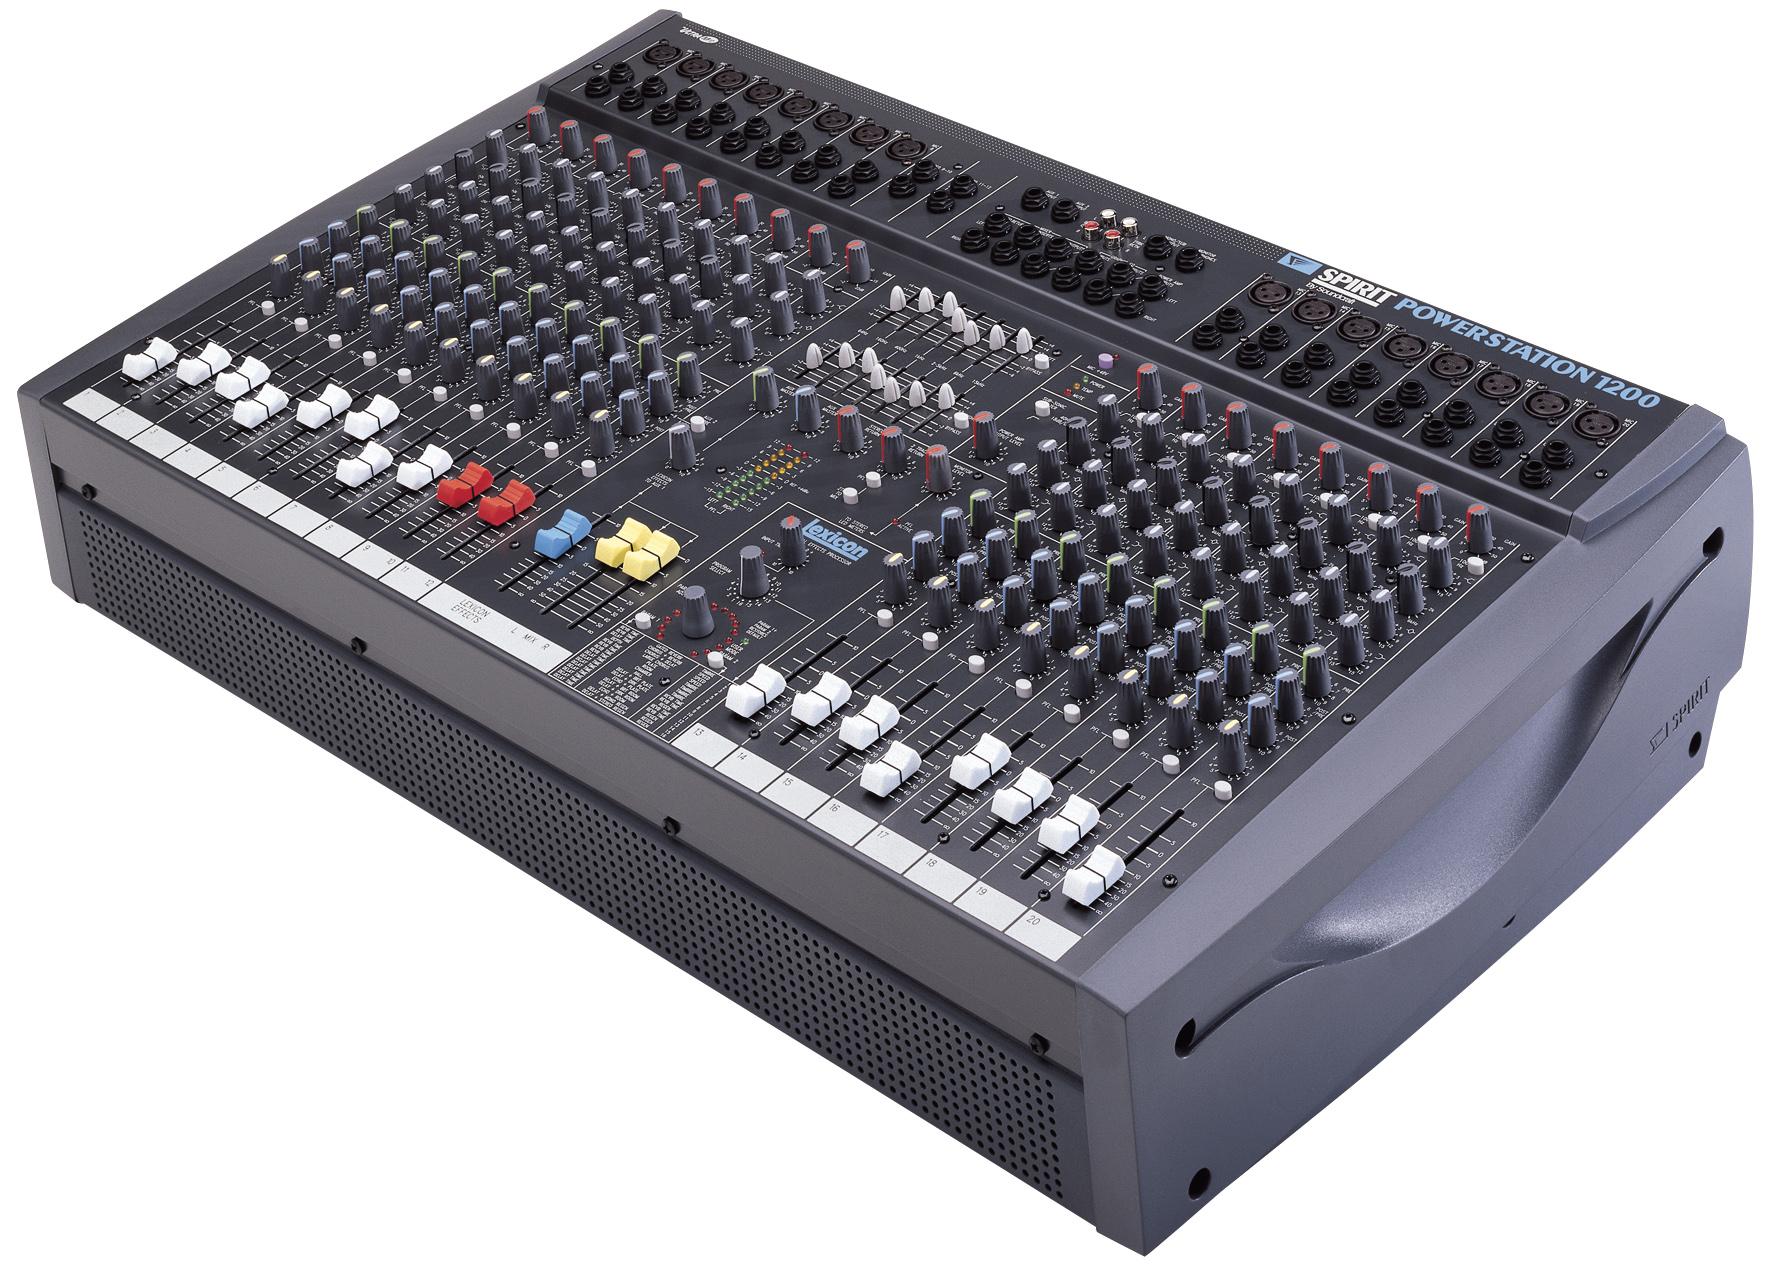 Spirit Powerstation 1200 Soundcraft Professional Audio Mixers Pa Mixer Interface Hookup Gearslutz Pro Community Larger Images